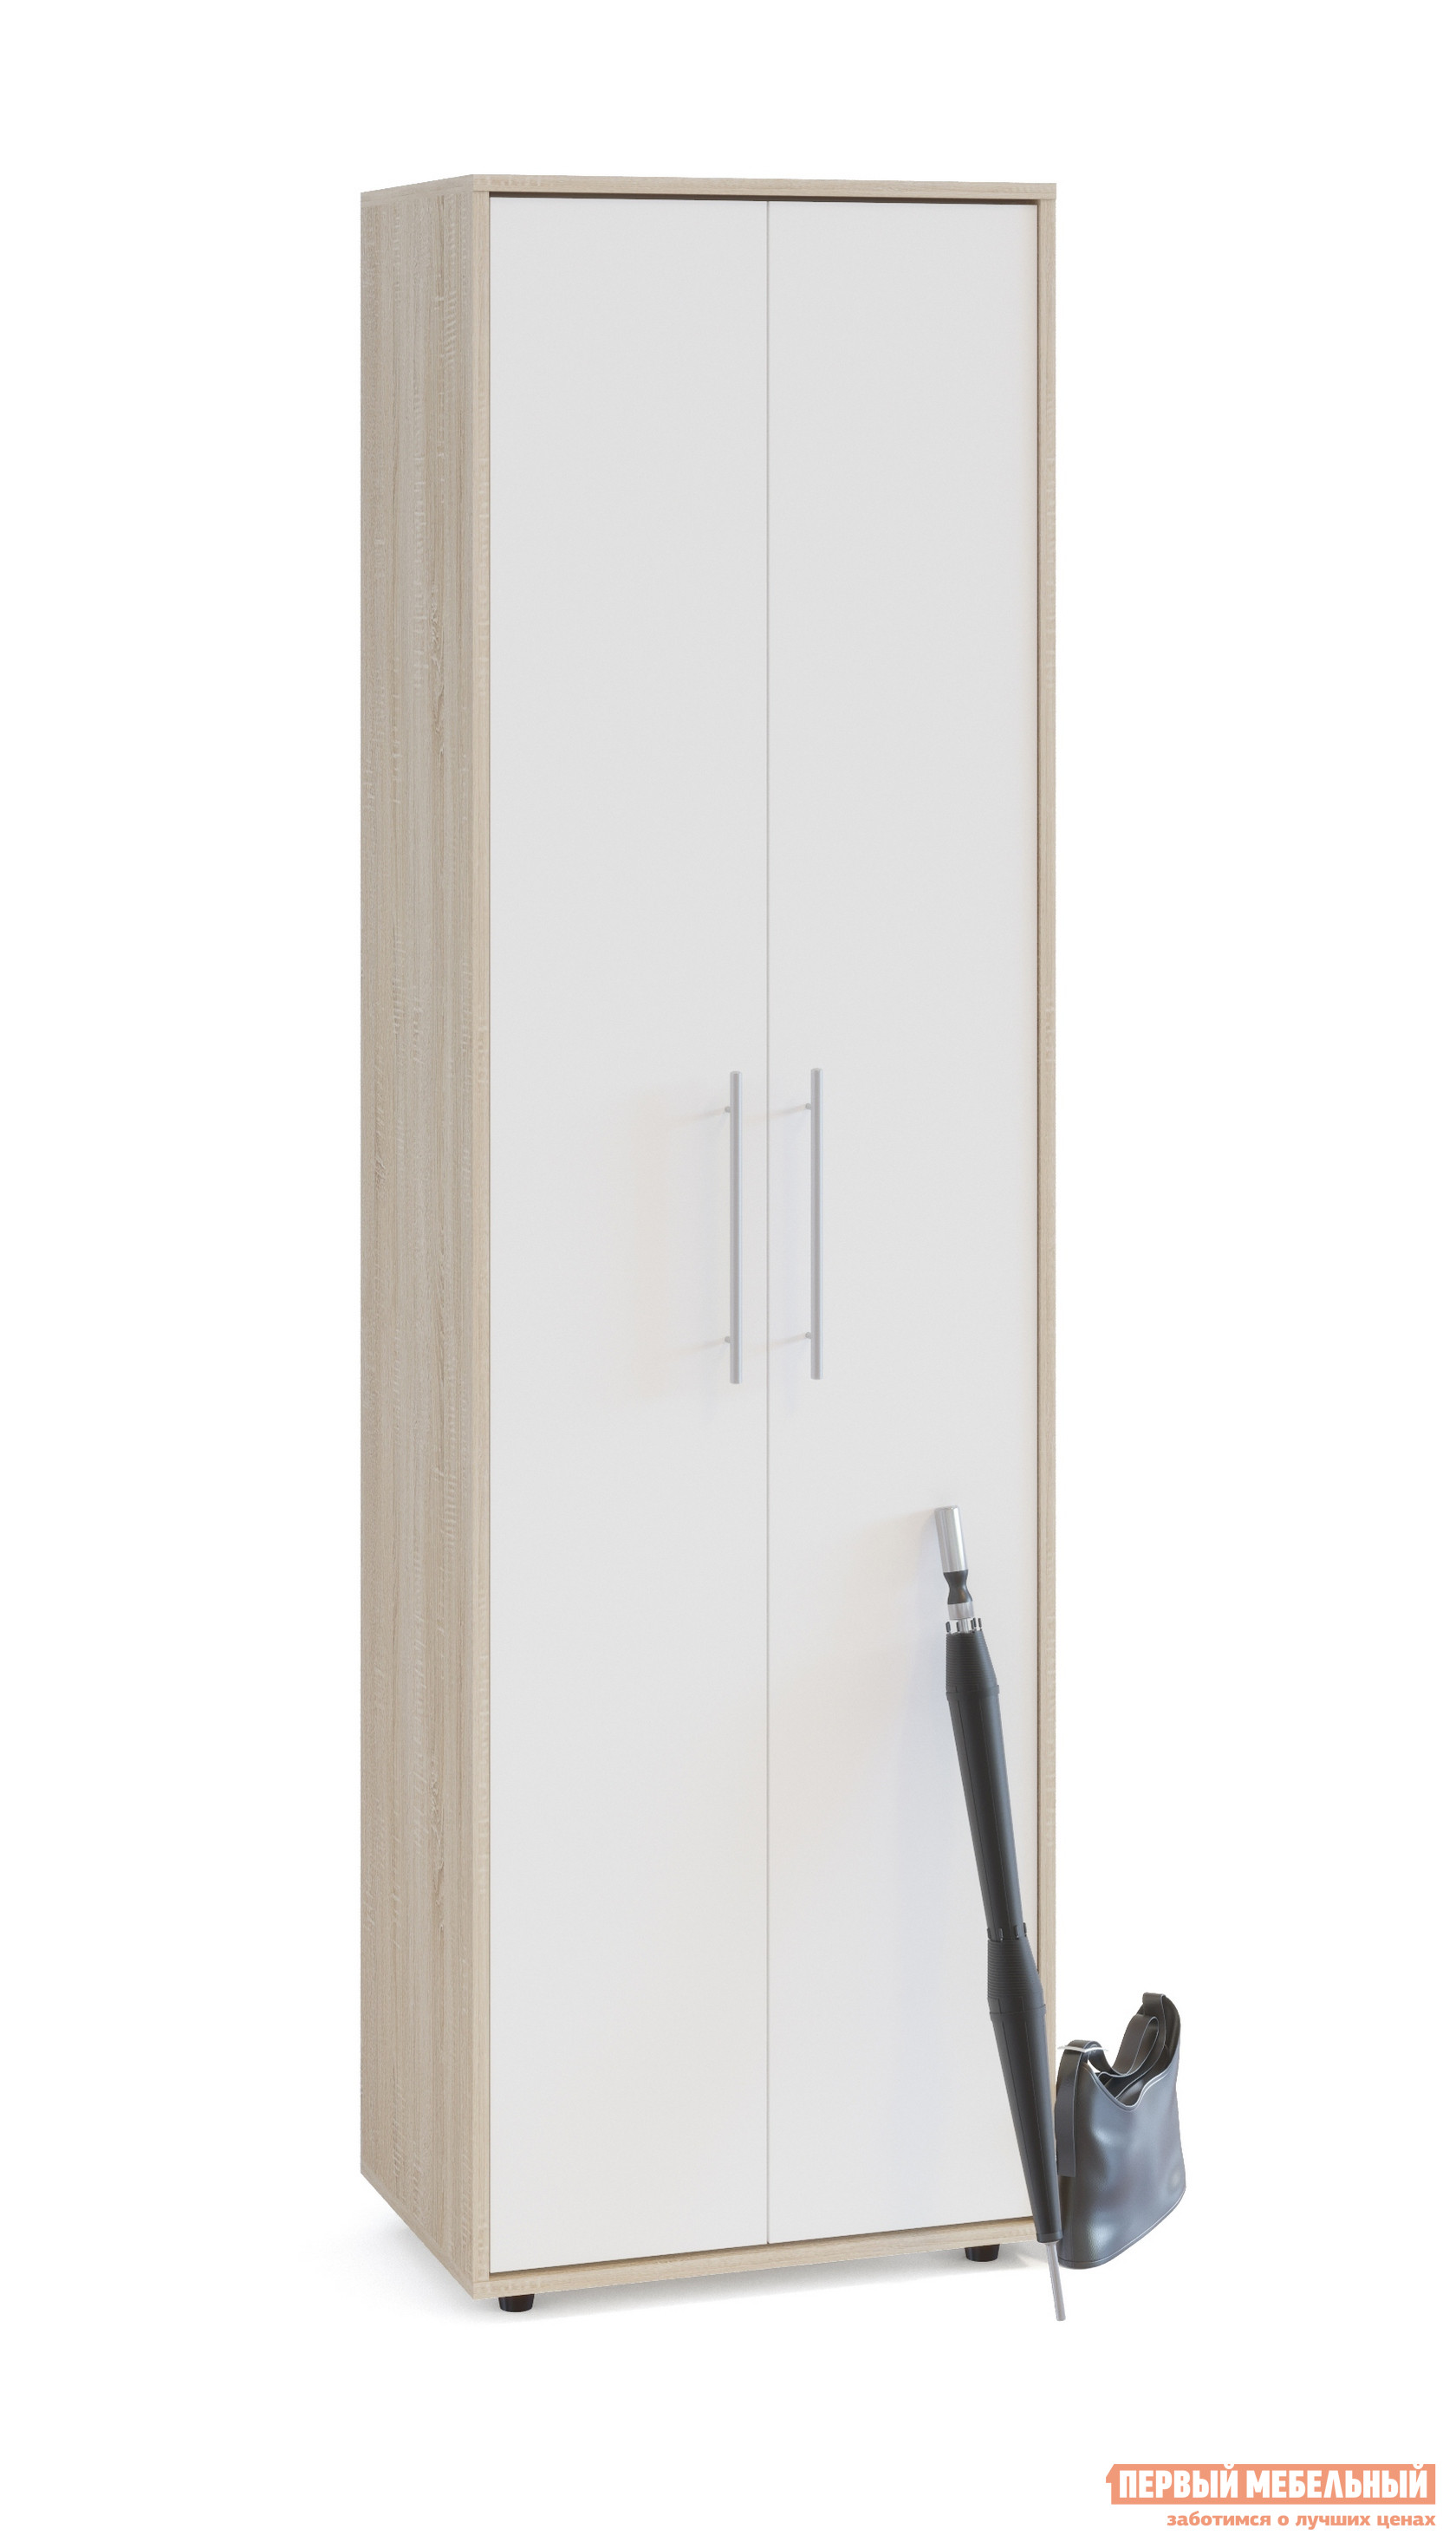 Шкаф распашной Сокол ШО-1 Дуб Сонома / Белый